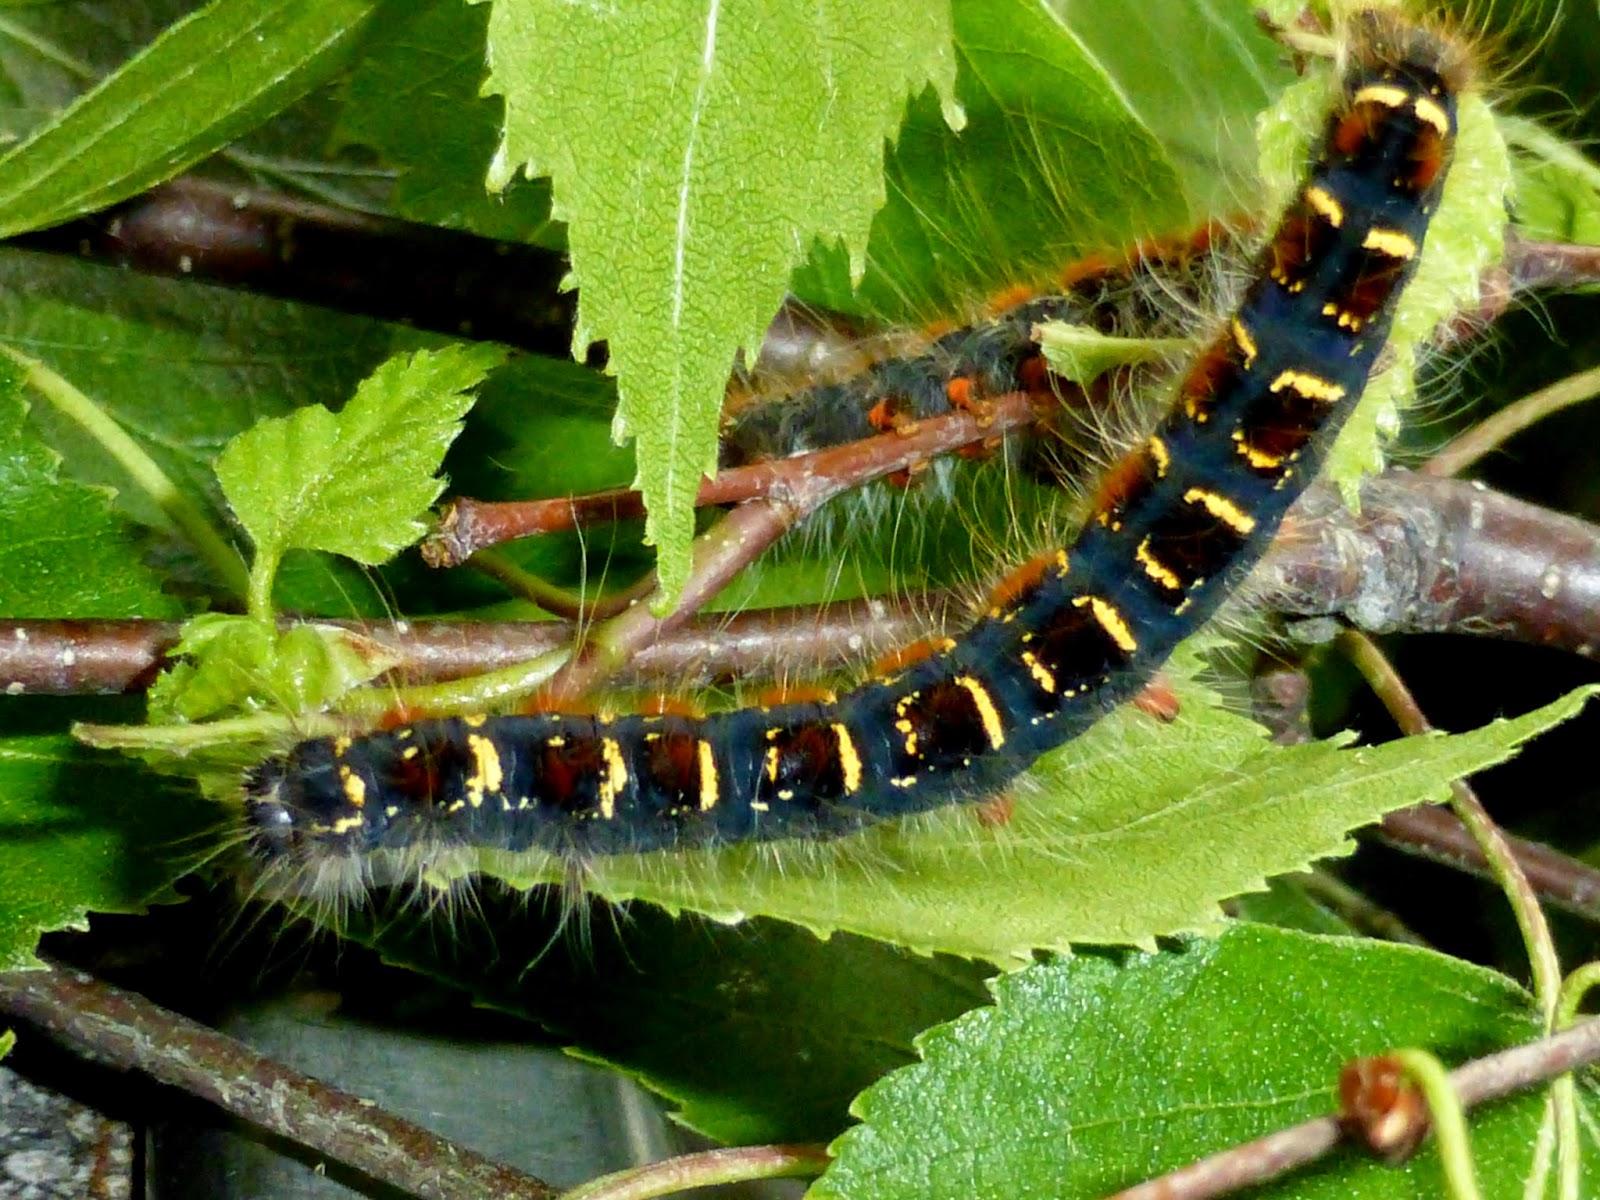 Eriogaster lanestris L5 caterpillar